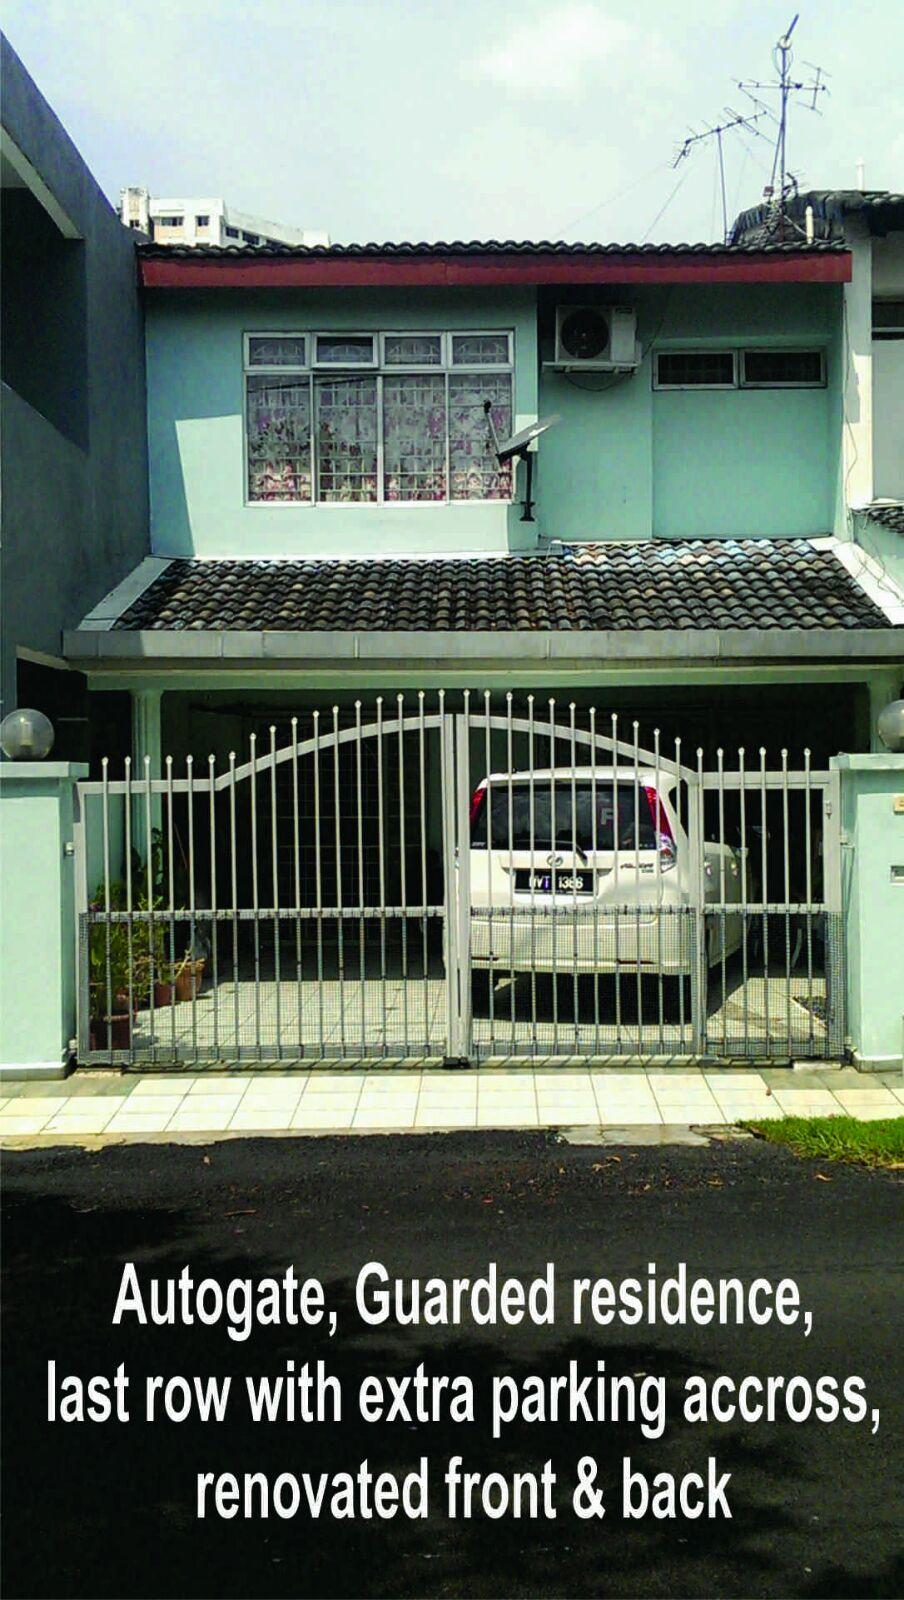 Taman Angsana Hilir 2-storey house